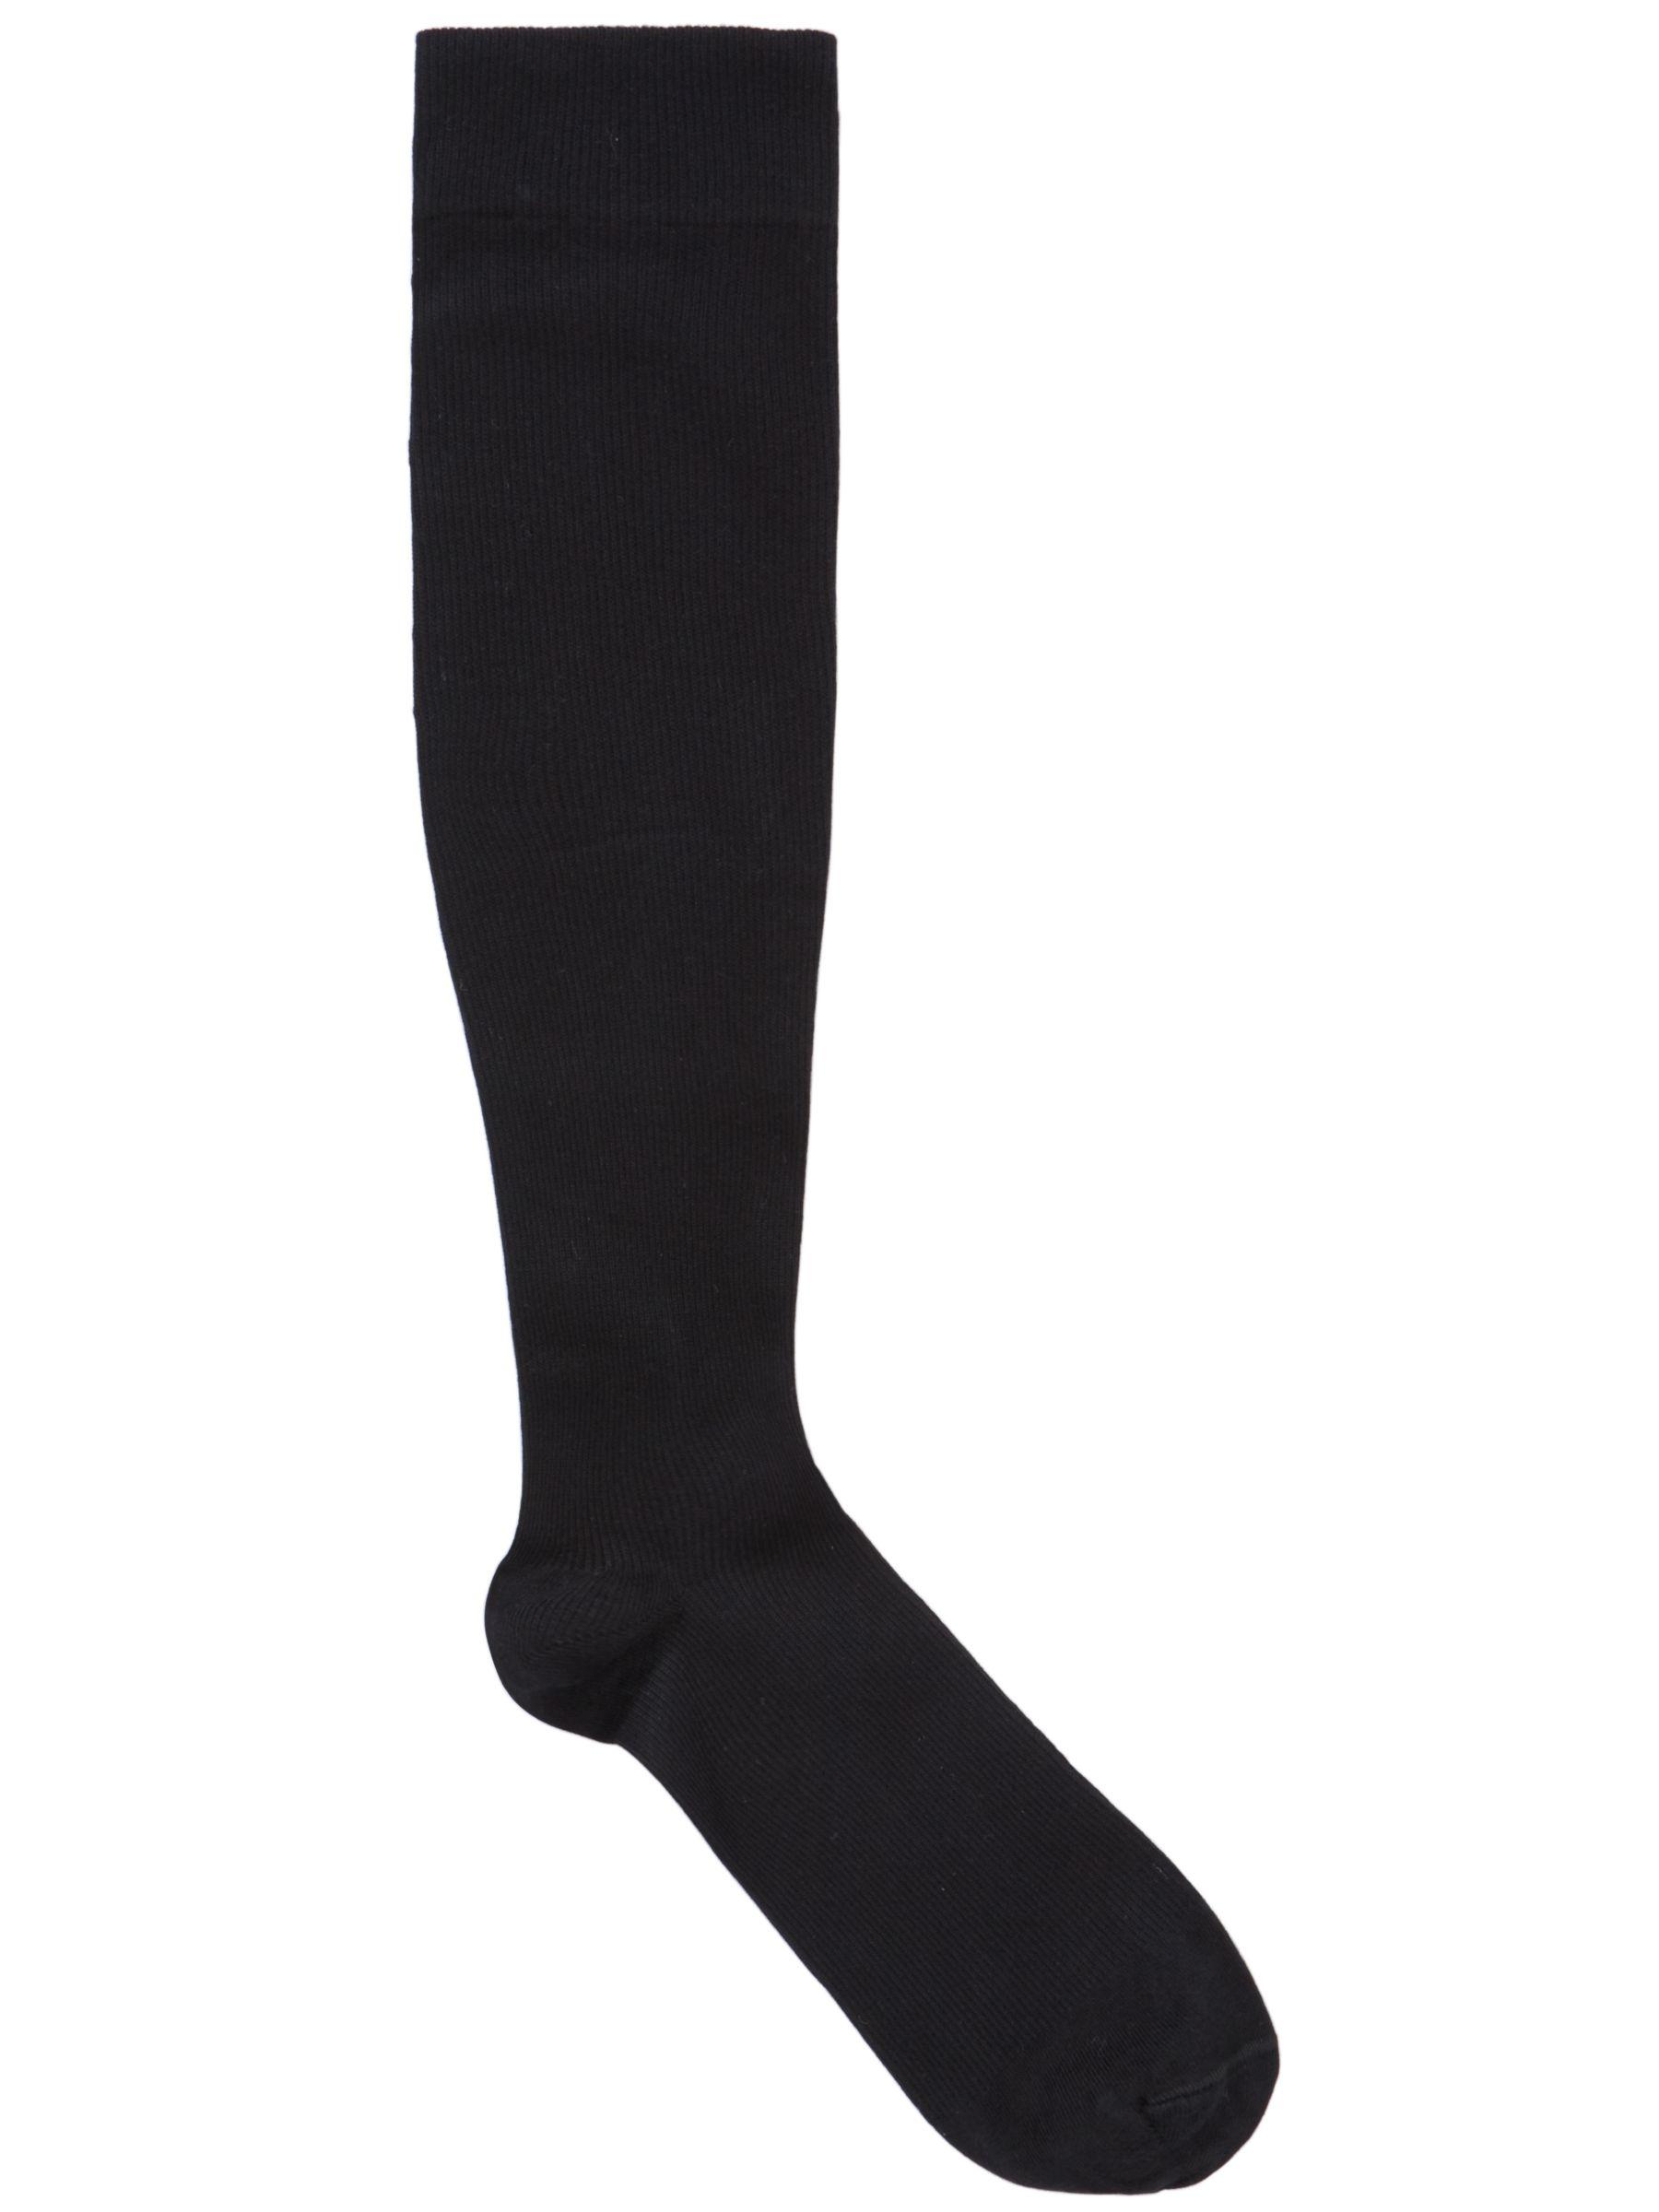 HJ Hall HJ Hall Flight Compression Socks, Black